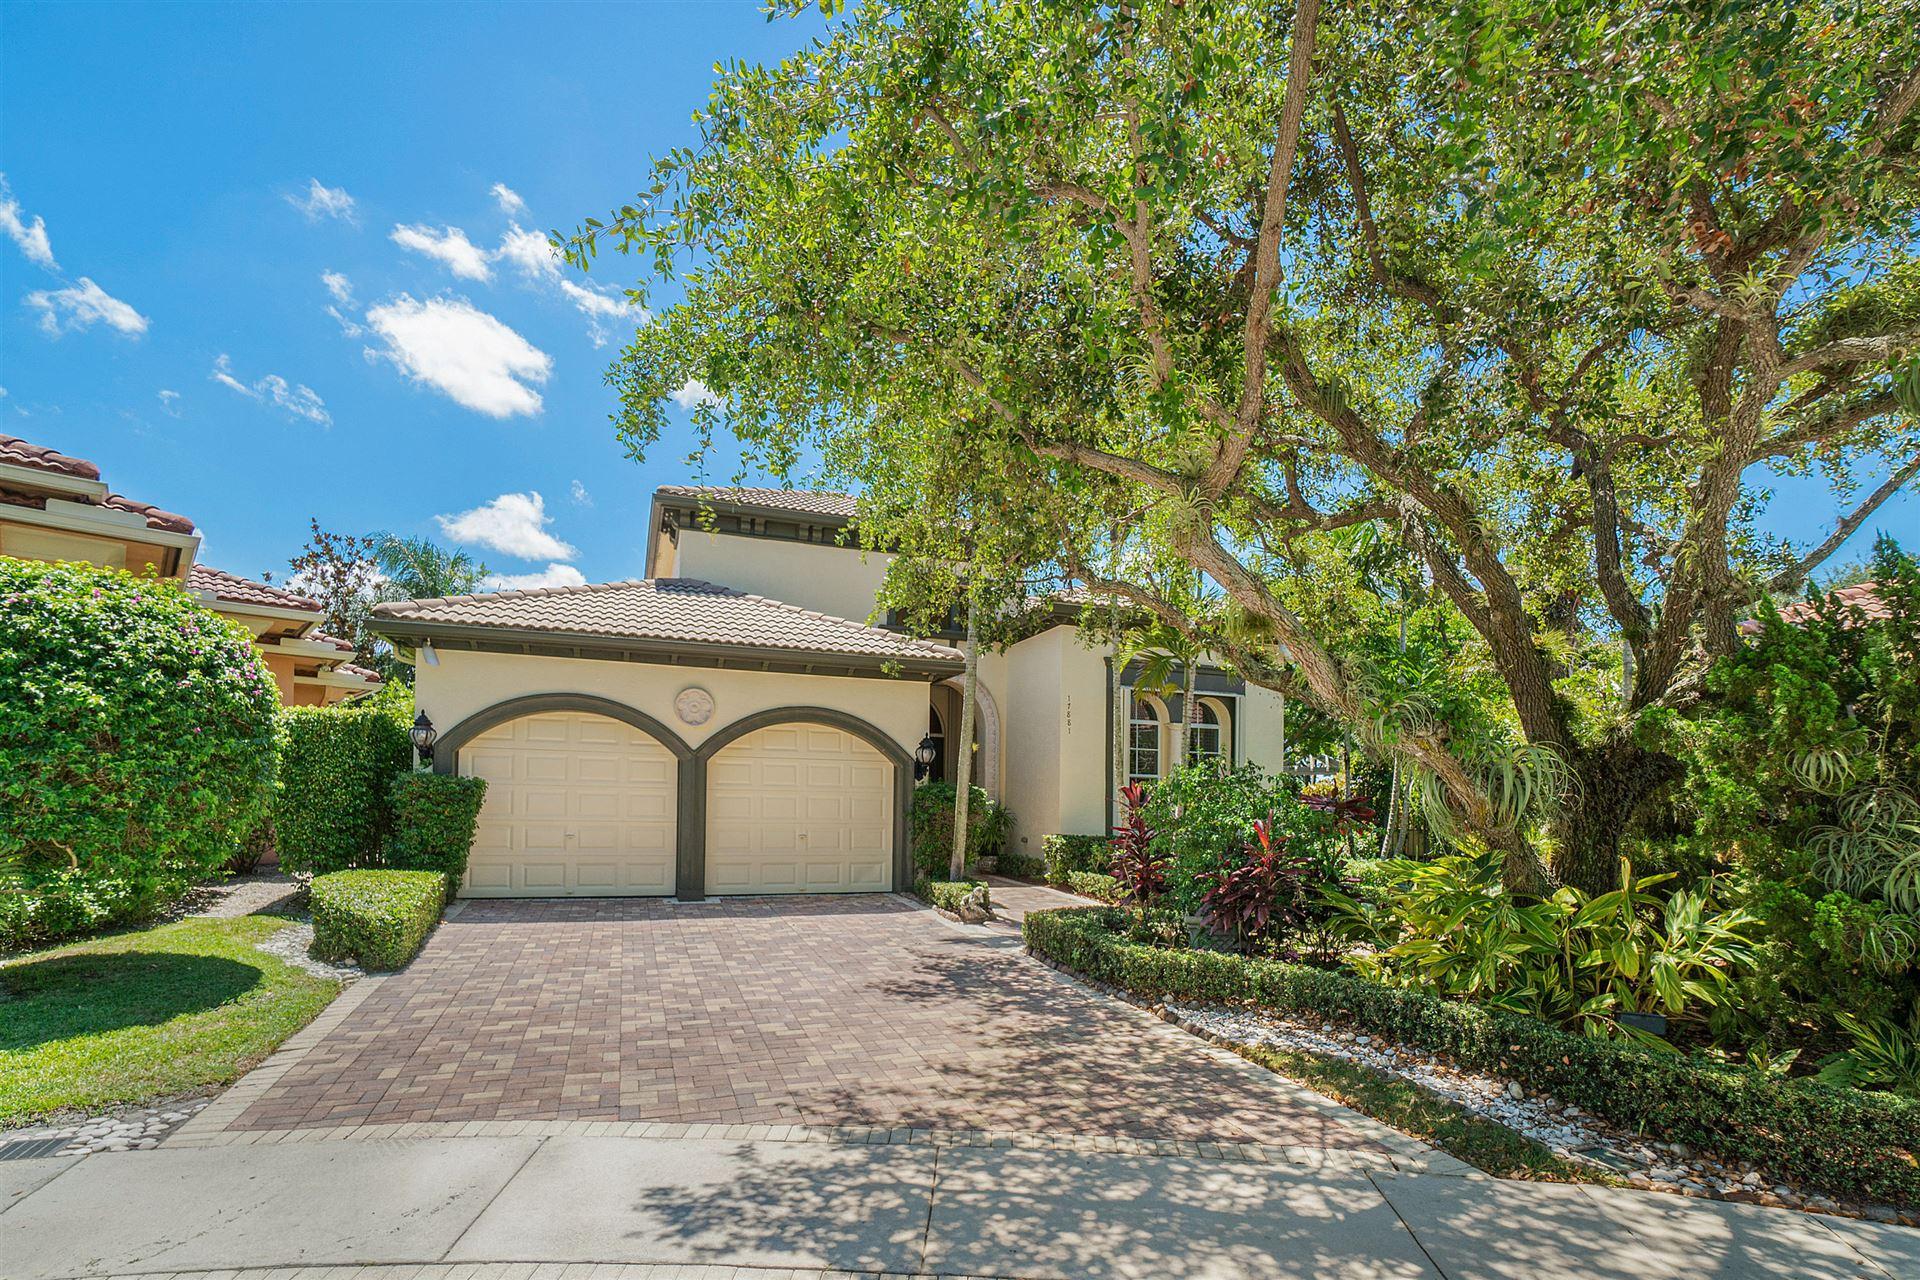 Photo of 17881 Villa Club Way, Boca Raton, FL 33496 (MLS # RX-10549261)